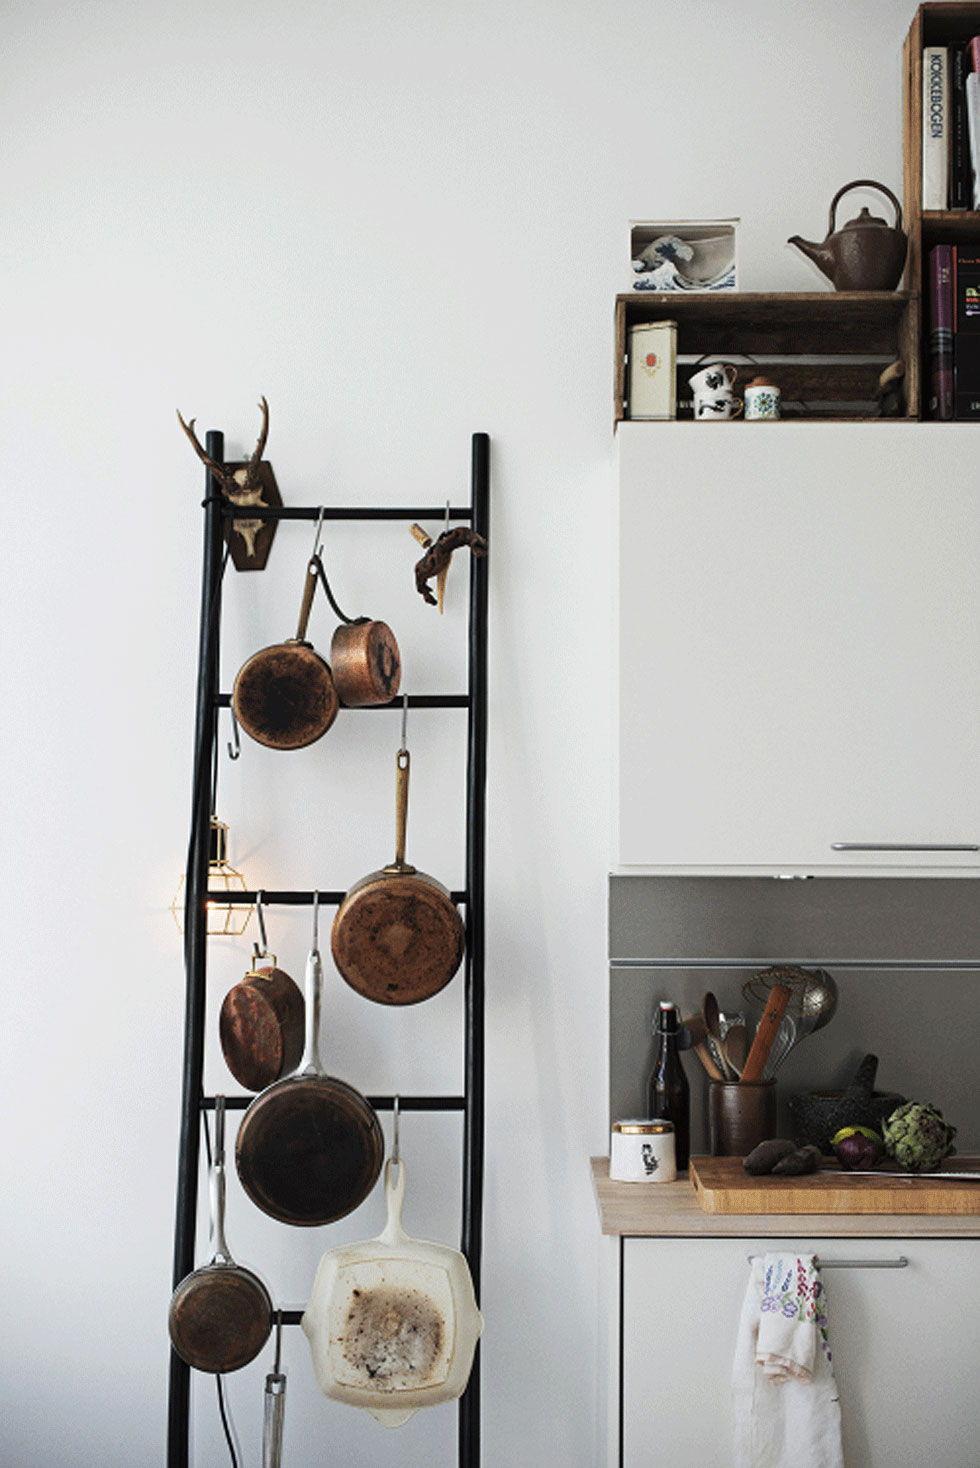 kitchen pots hanging